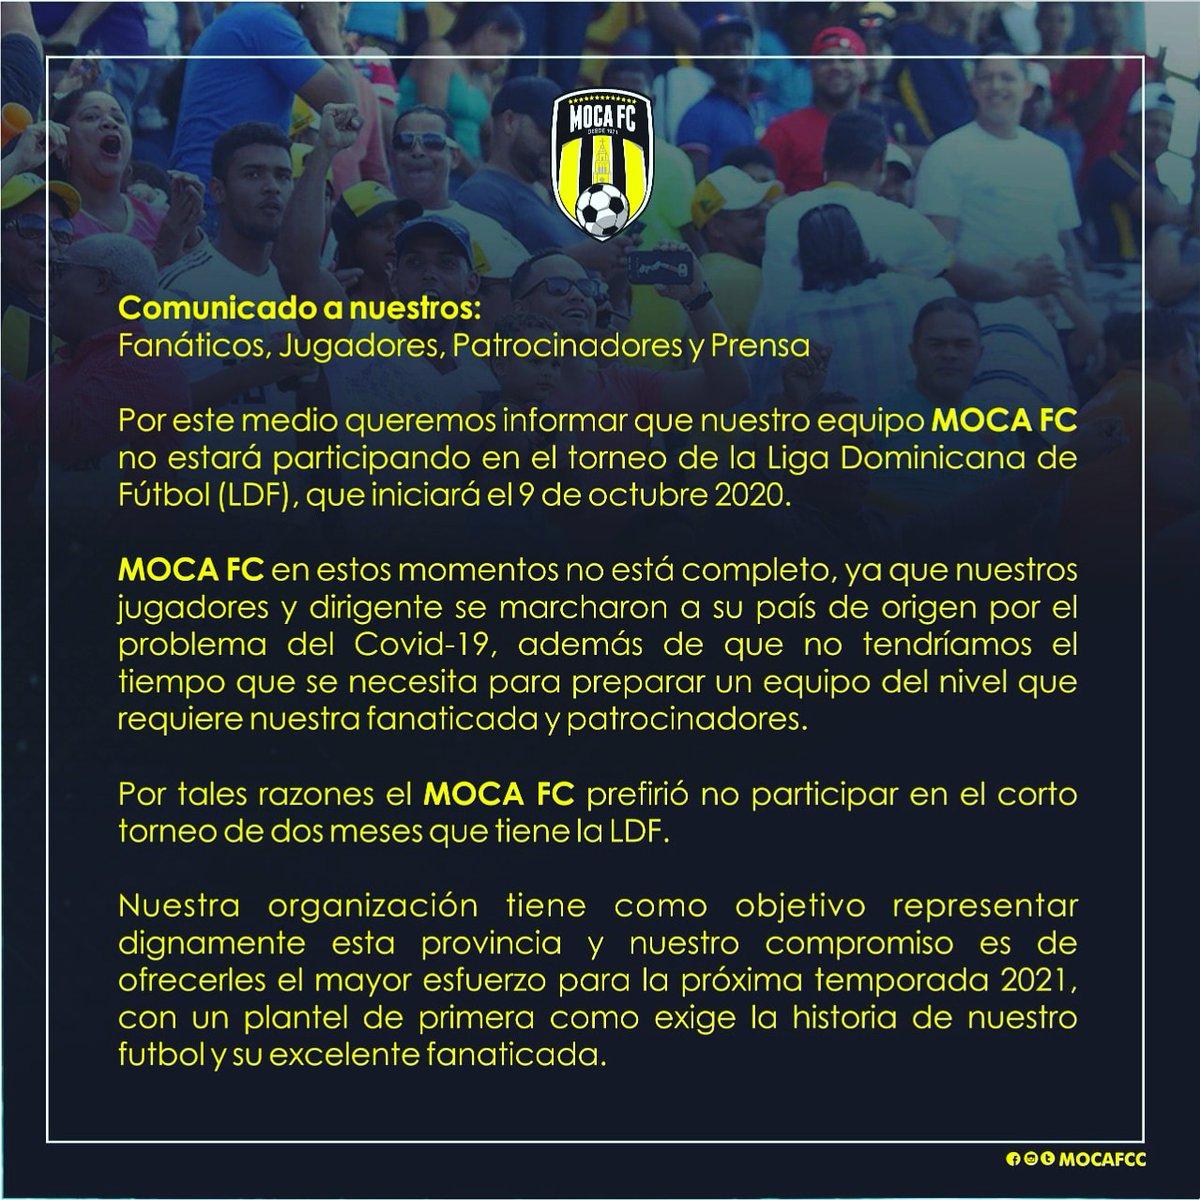 Comunicado  #mocafc #soymocafc #ldf2020  #ldf #futbol #potd #rd #liga #moca #week #entrenamiento #day #passion #viernes https://t.co/ckggnTt6Cn